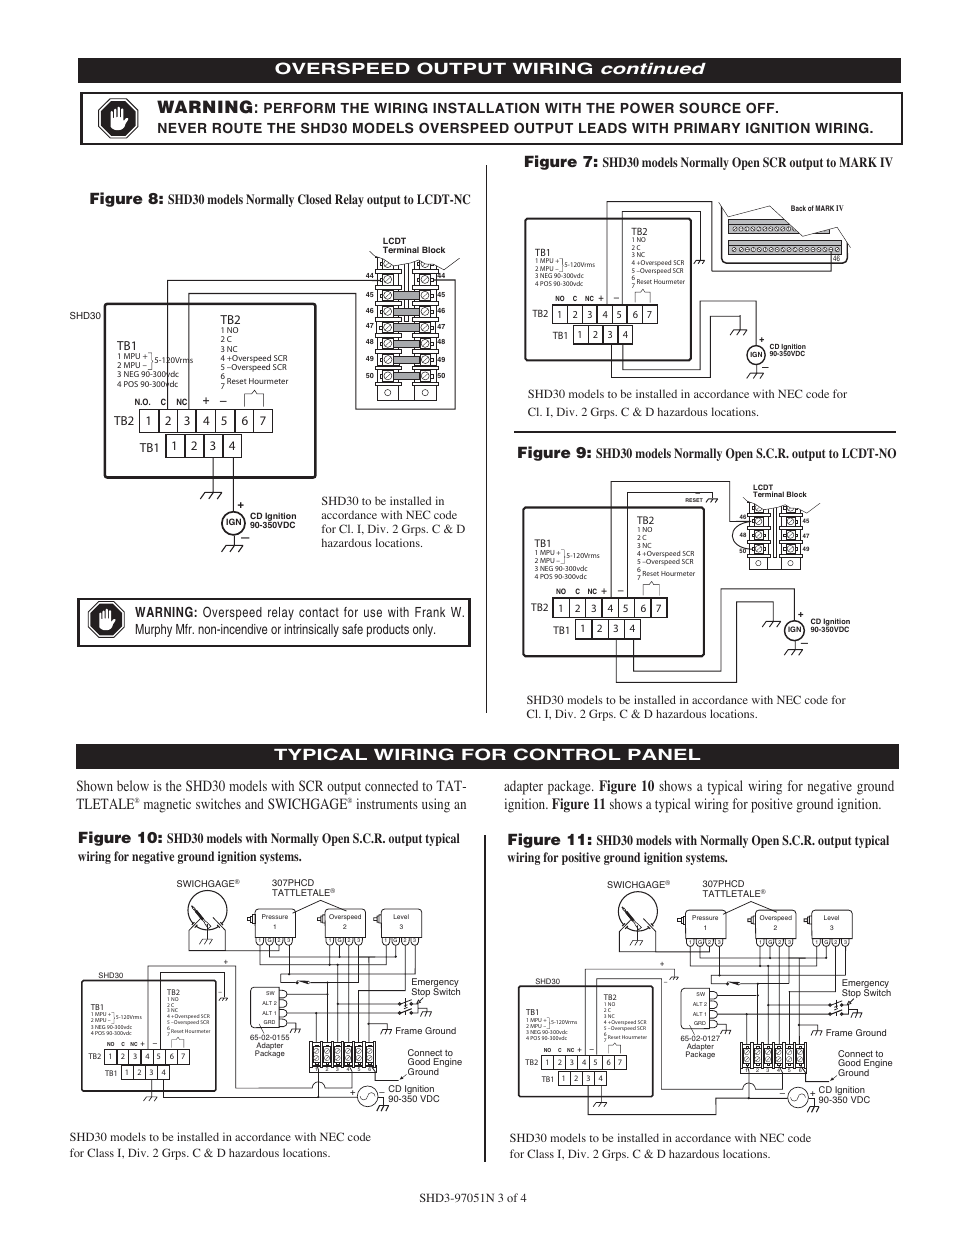 medium resolution of warning continued overspeed output wiring figure 8 figure 7 figure 9